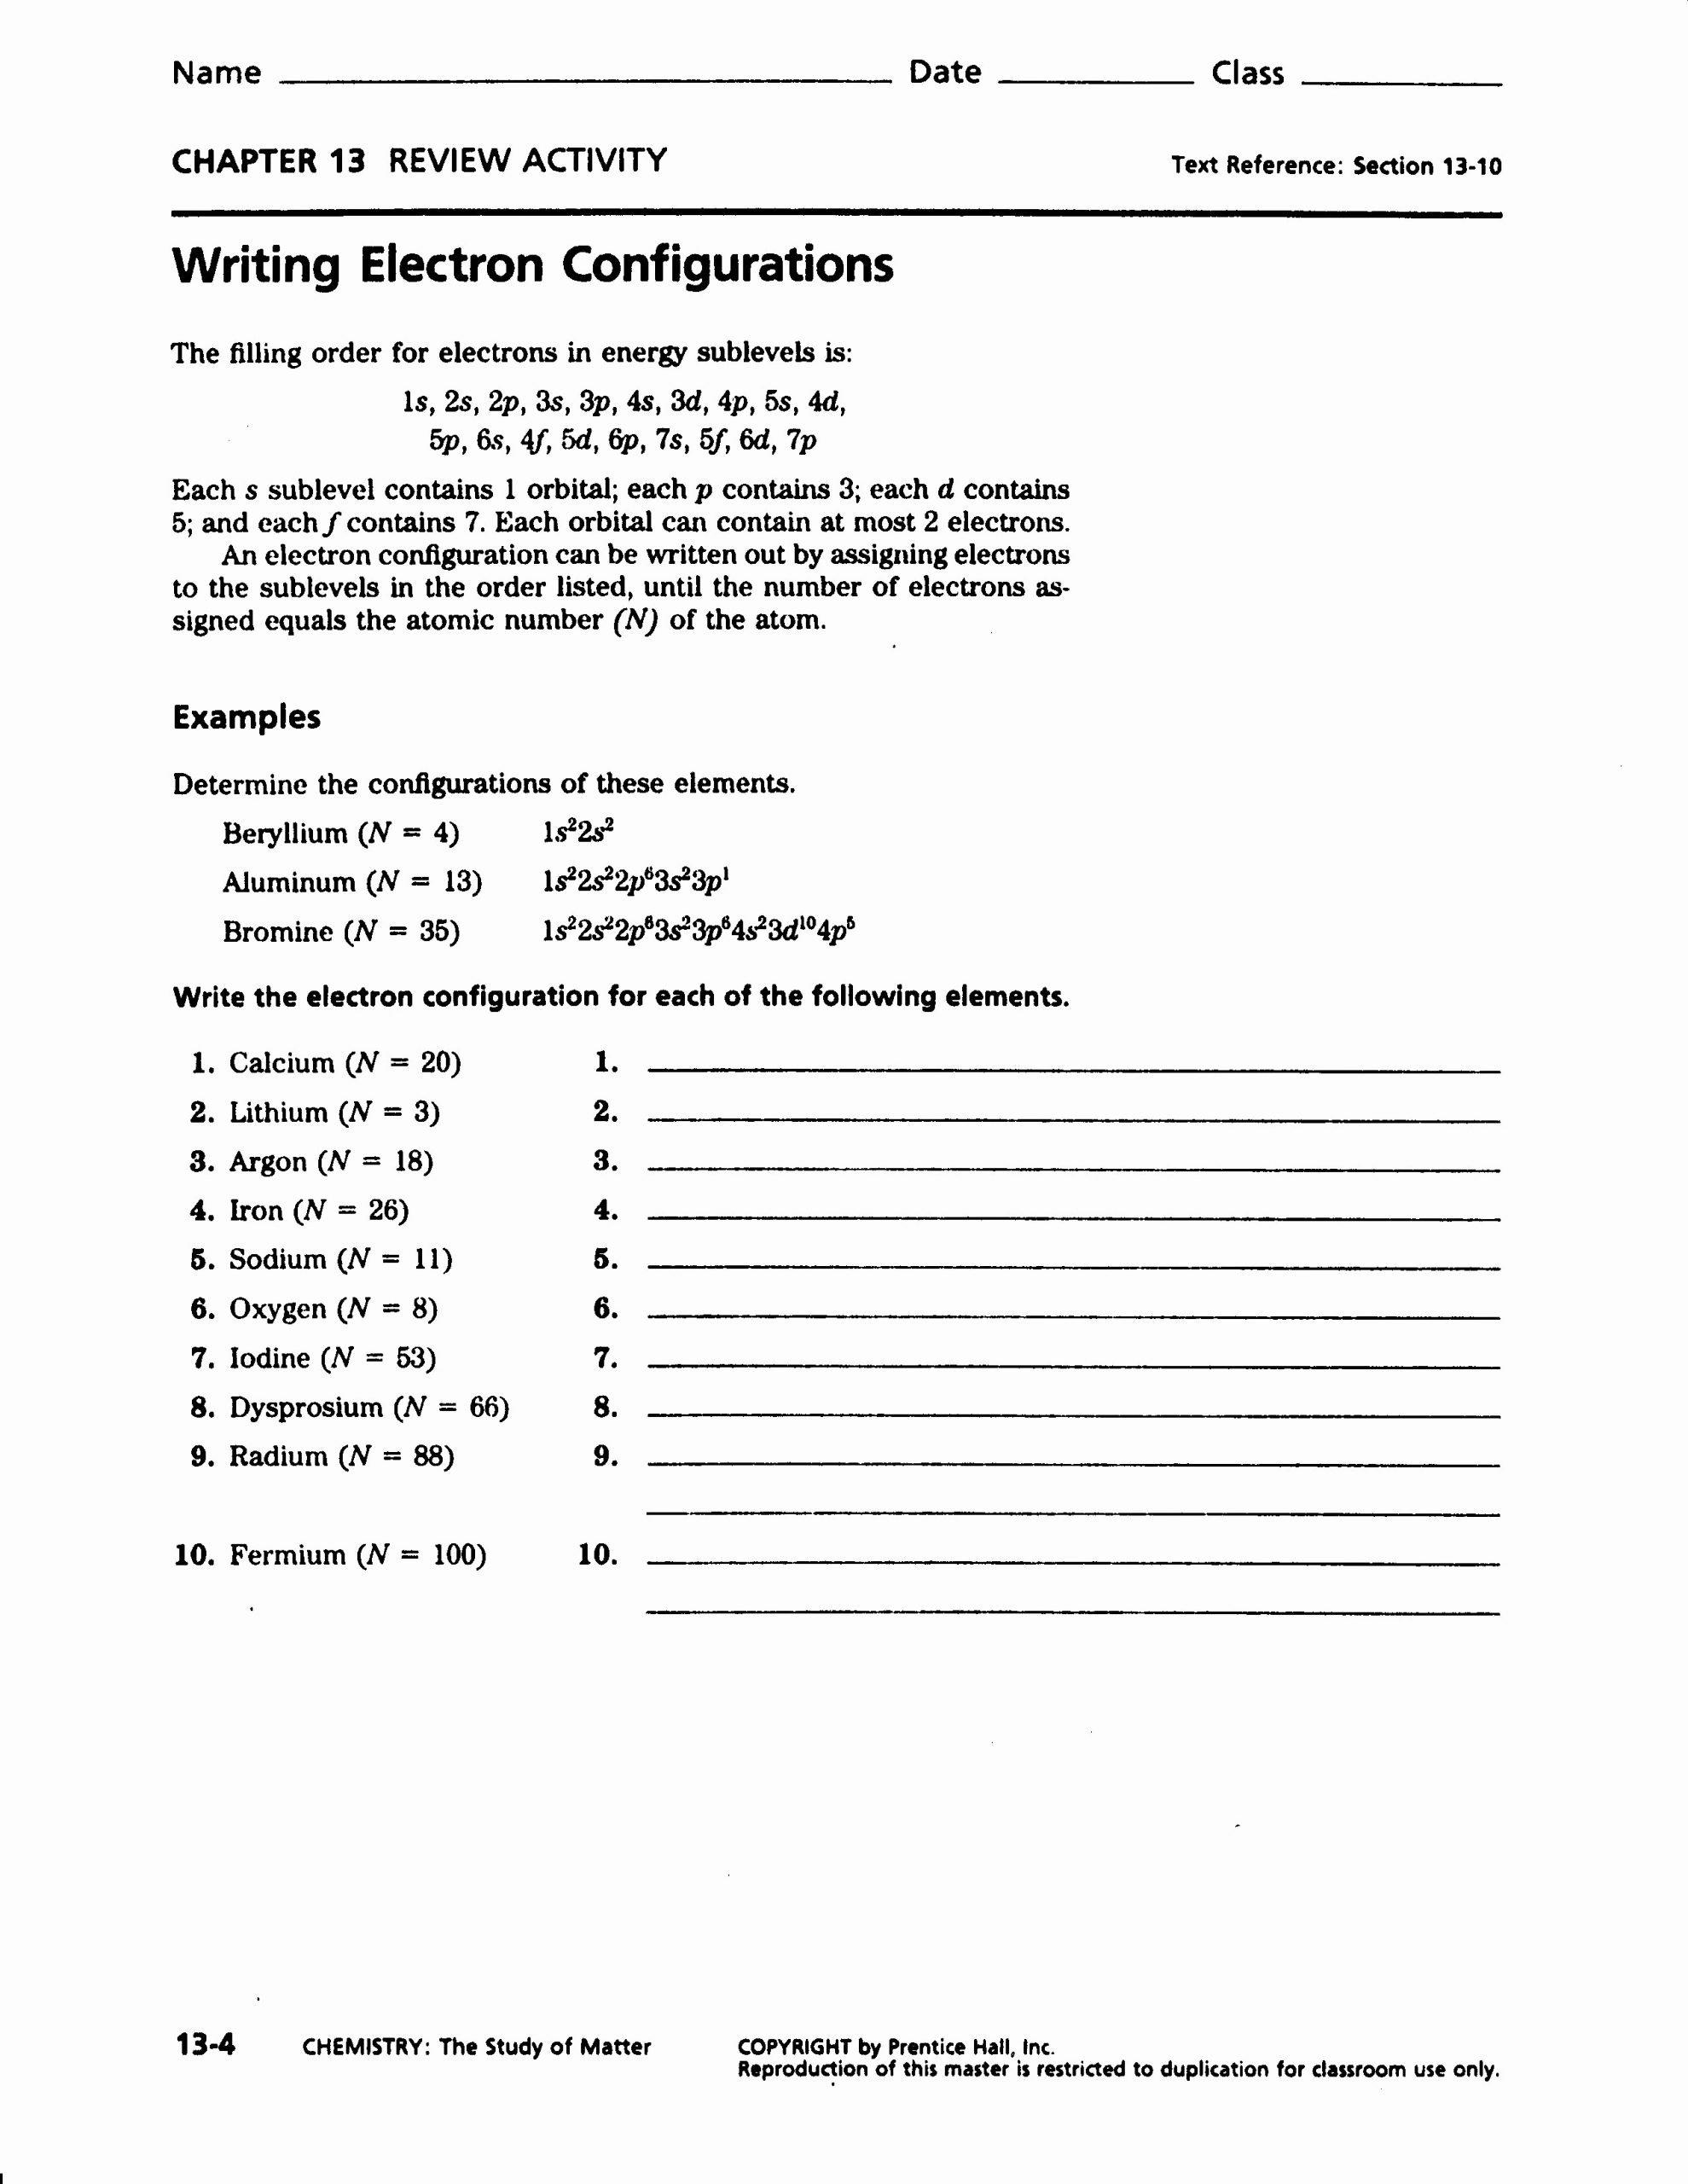 Electron Configuration Practice Worksheet Answers New Electron Configuration Worksheet Answers Part A Worksheets